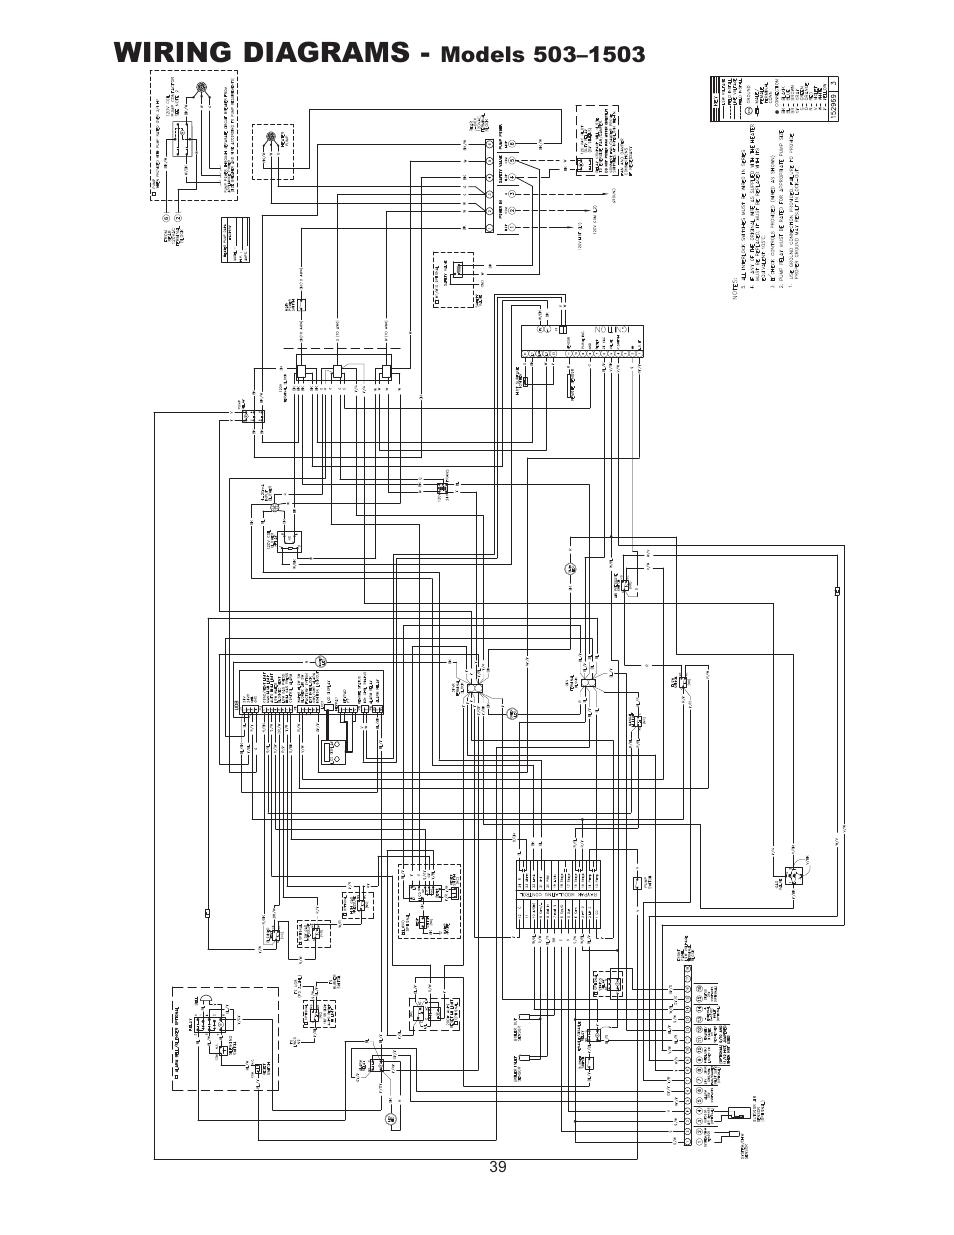 raypak boiler wiring diagram wiring diagrams raypak mvb 503 2003 user manual page 39 56  wiring diagrams raypak mvb 503 2003